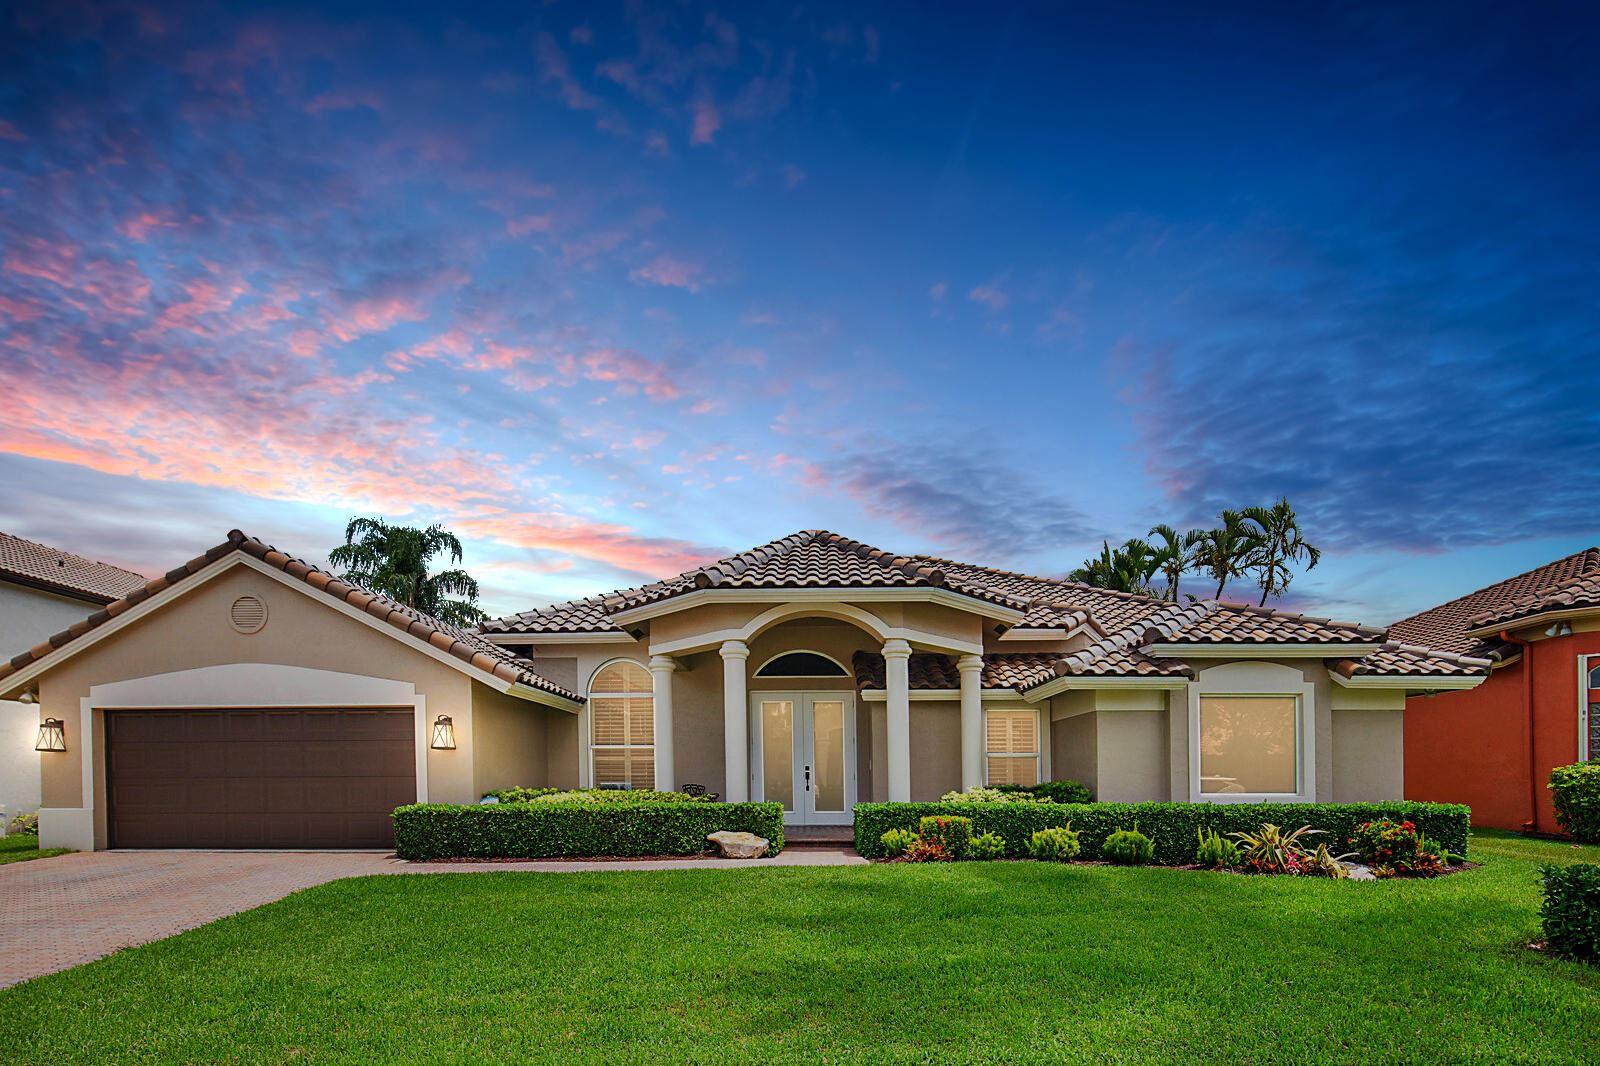 20161 Palm Island Drive, Boca Raton, FL 33498 - #: RX-10628526